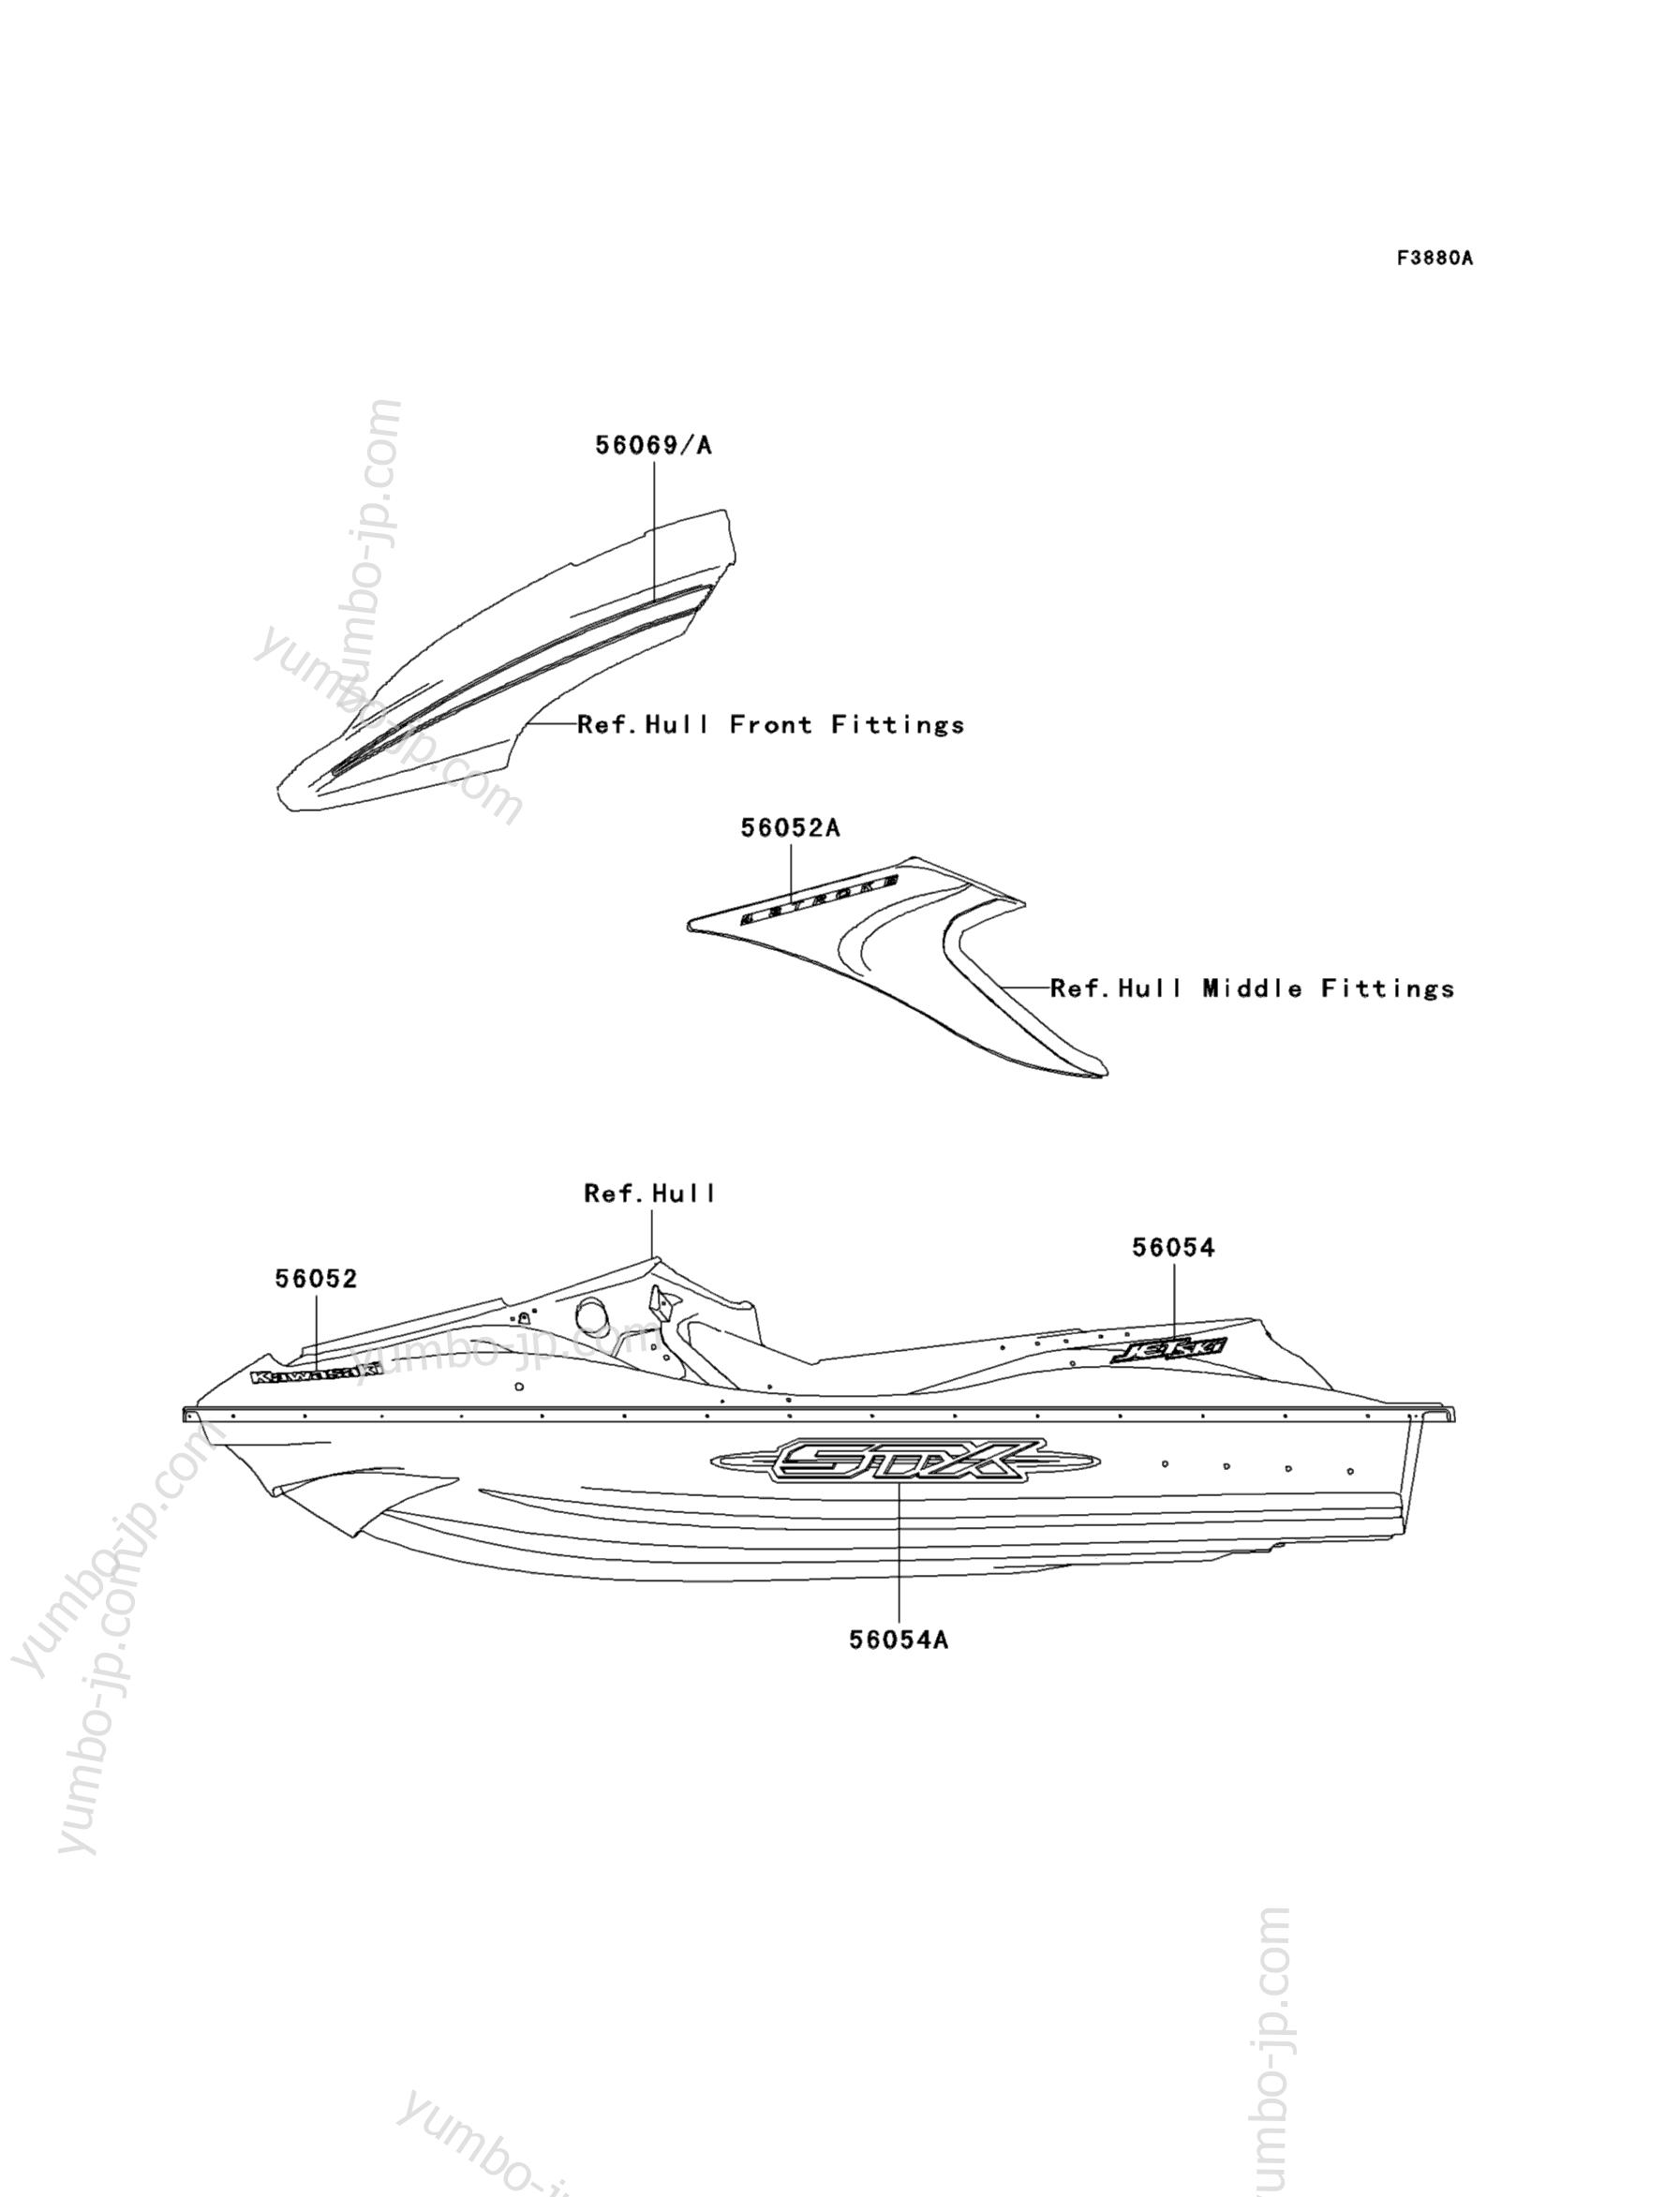 Decals(DAF) для гидроцикла KAWASAKI JET SKI STX (JT1500DAF) 2010 г.